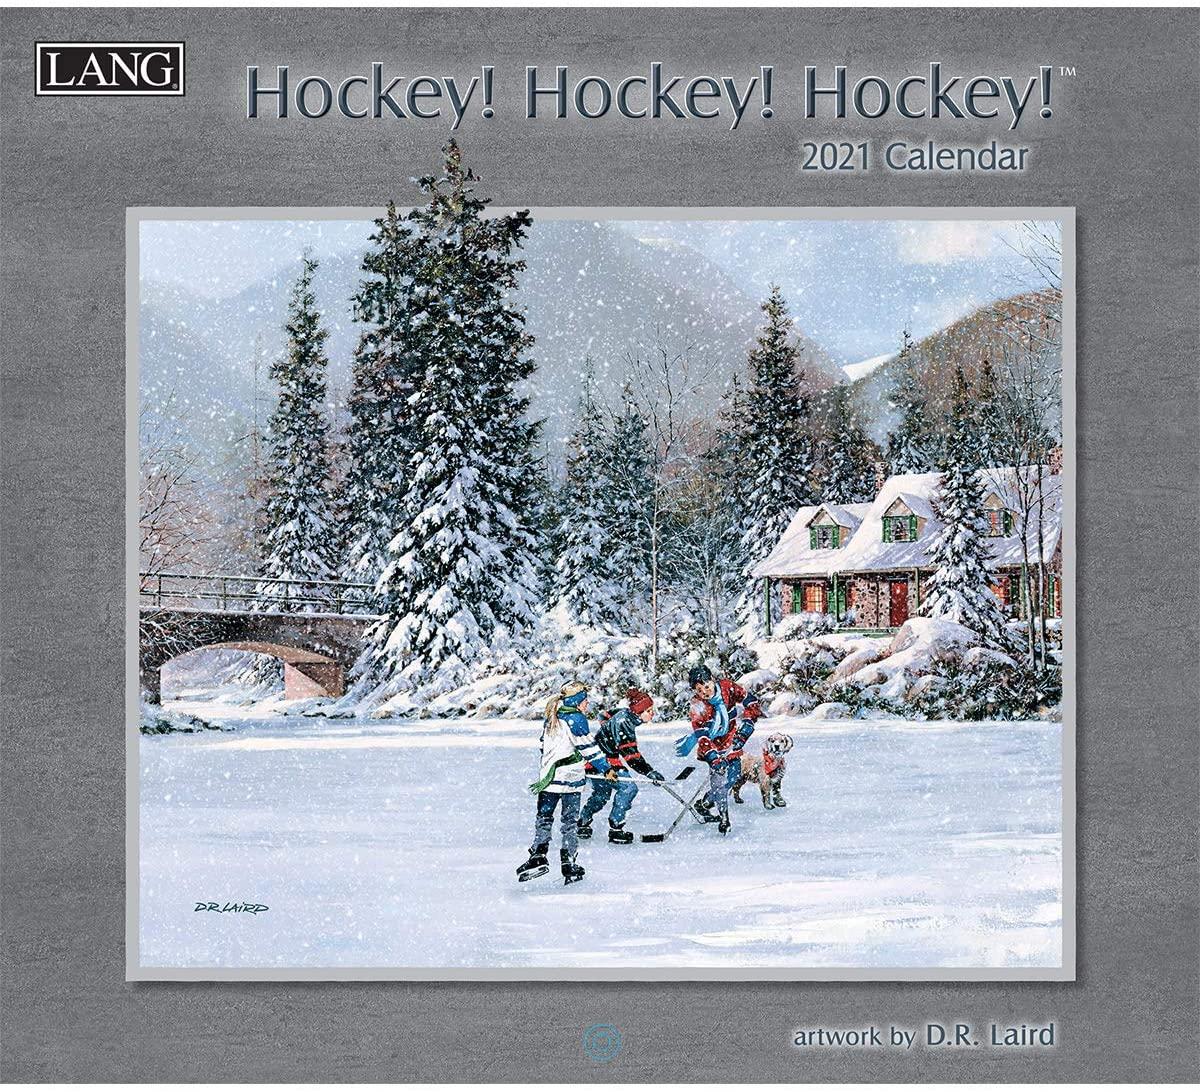 LANG Hockey 2021 Wall Calendar (21991001916)